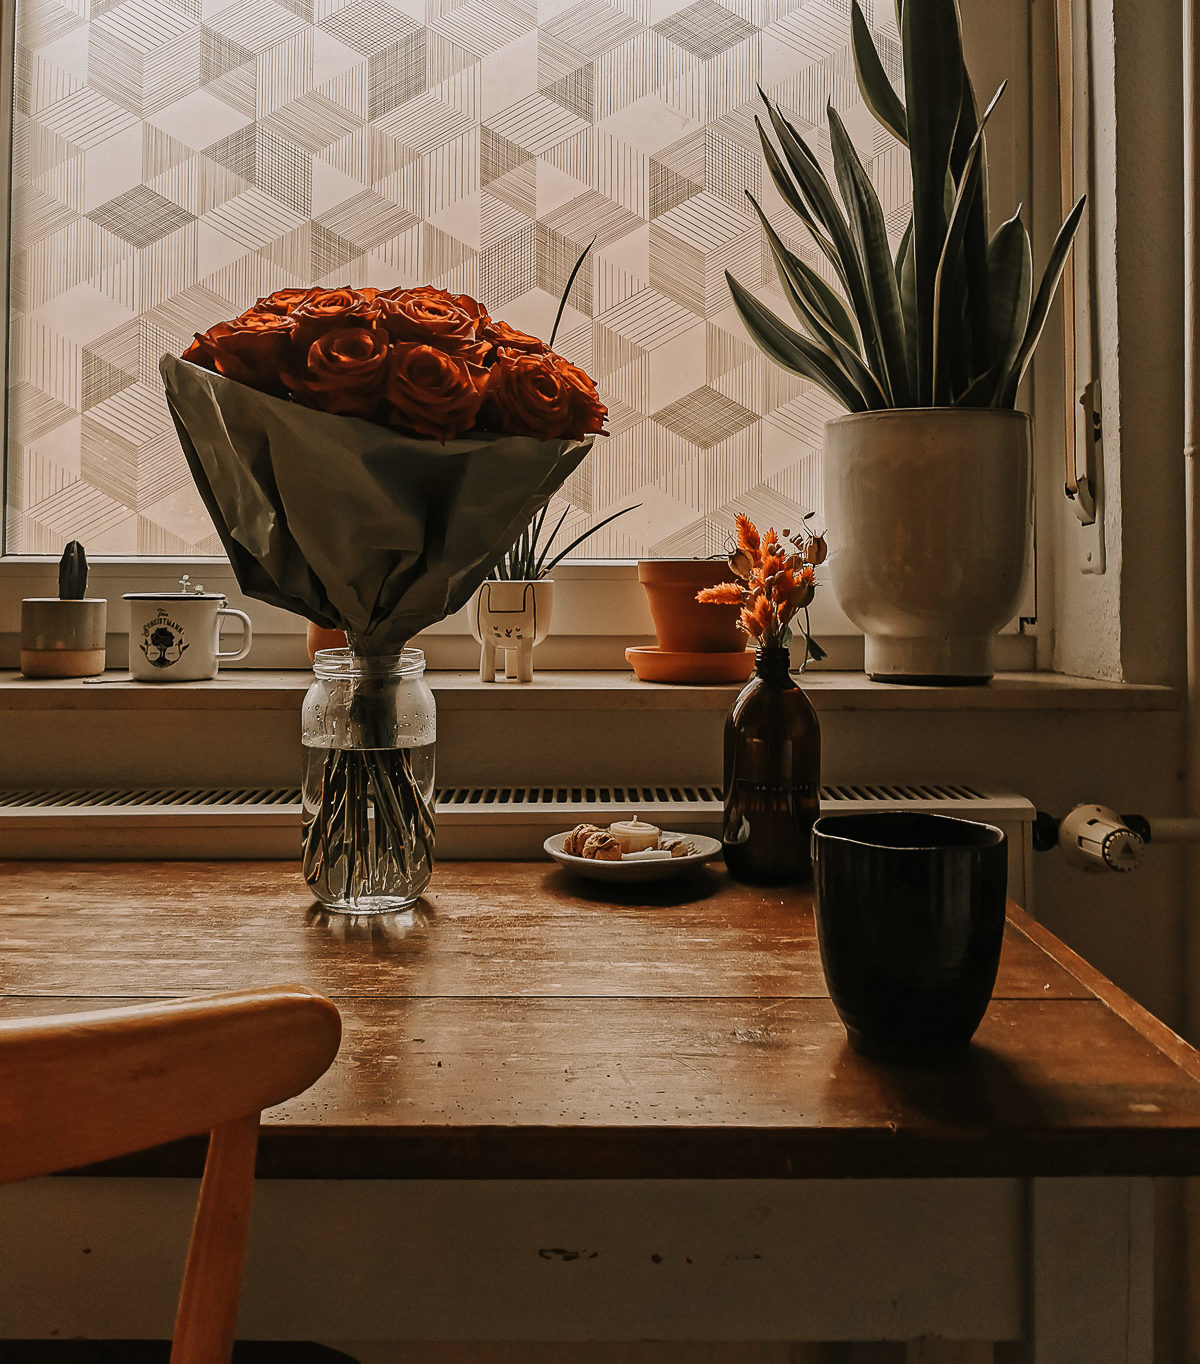 Faire Pflanzen, faire Pflanzen, nachhaltig Blumen kaufen, faire Blumen, faire Rosen, nachhaltige Blumen, nachhaltige Pflanzen, ökologische Pflanzen, Pflanzenindustrie, pflanzen kaufen nachhaltig